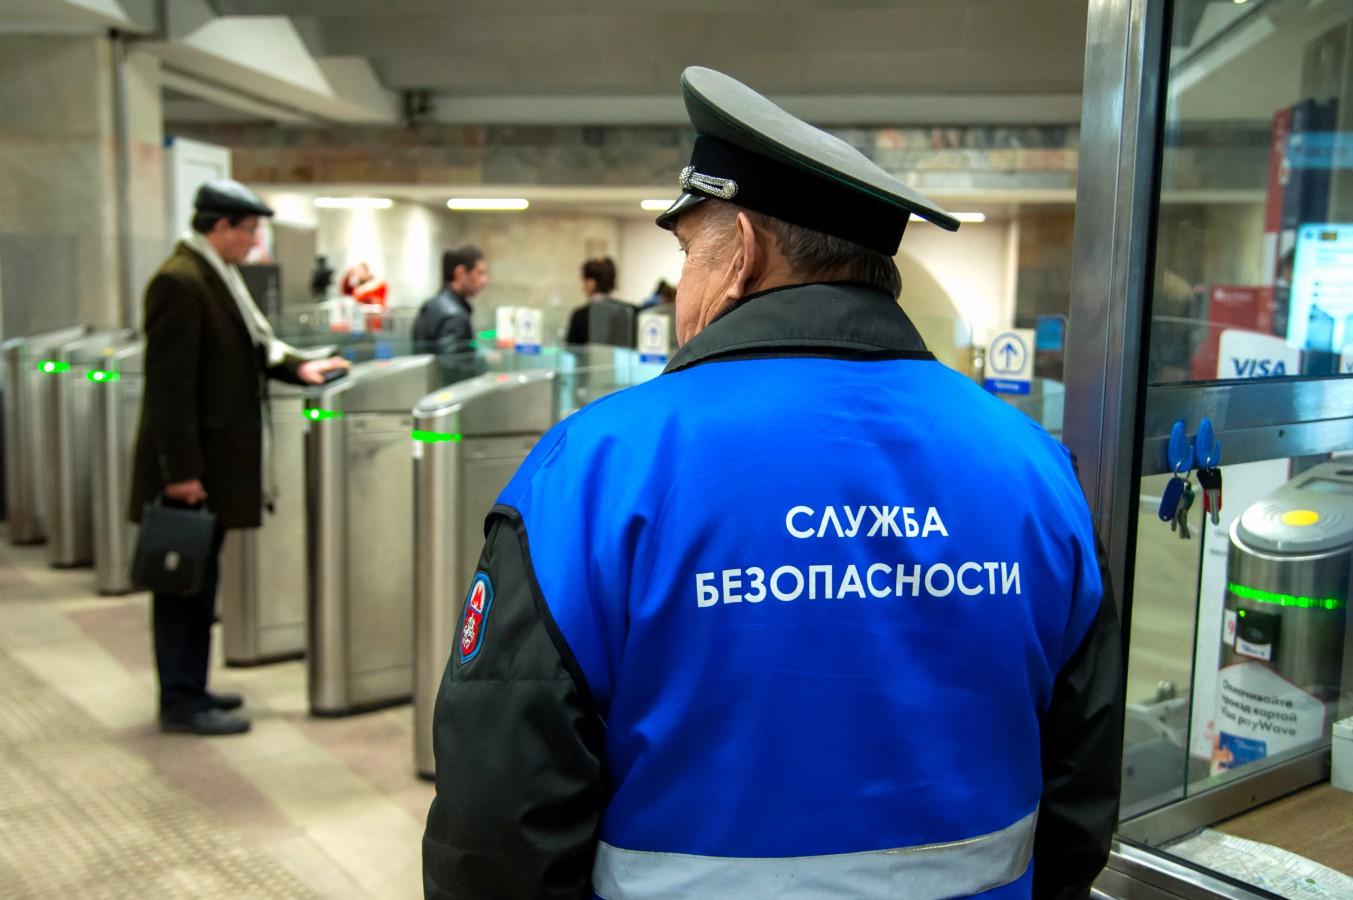 Фото 2. Служба безопасности Московского метрополитена